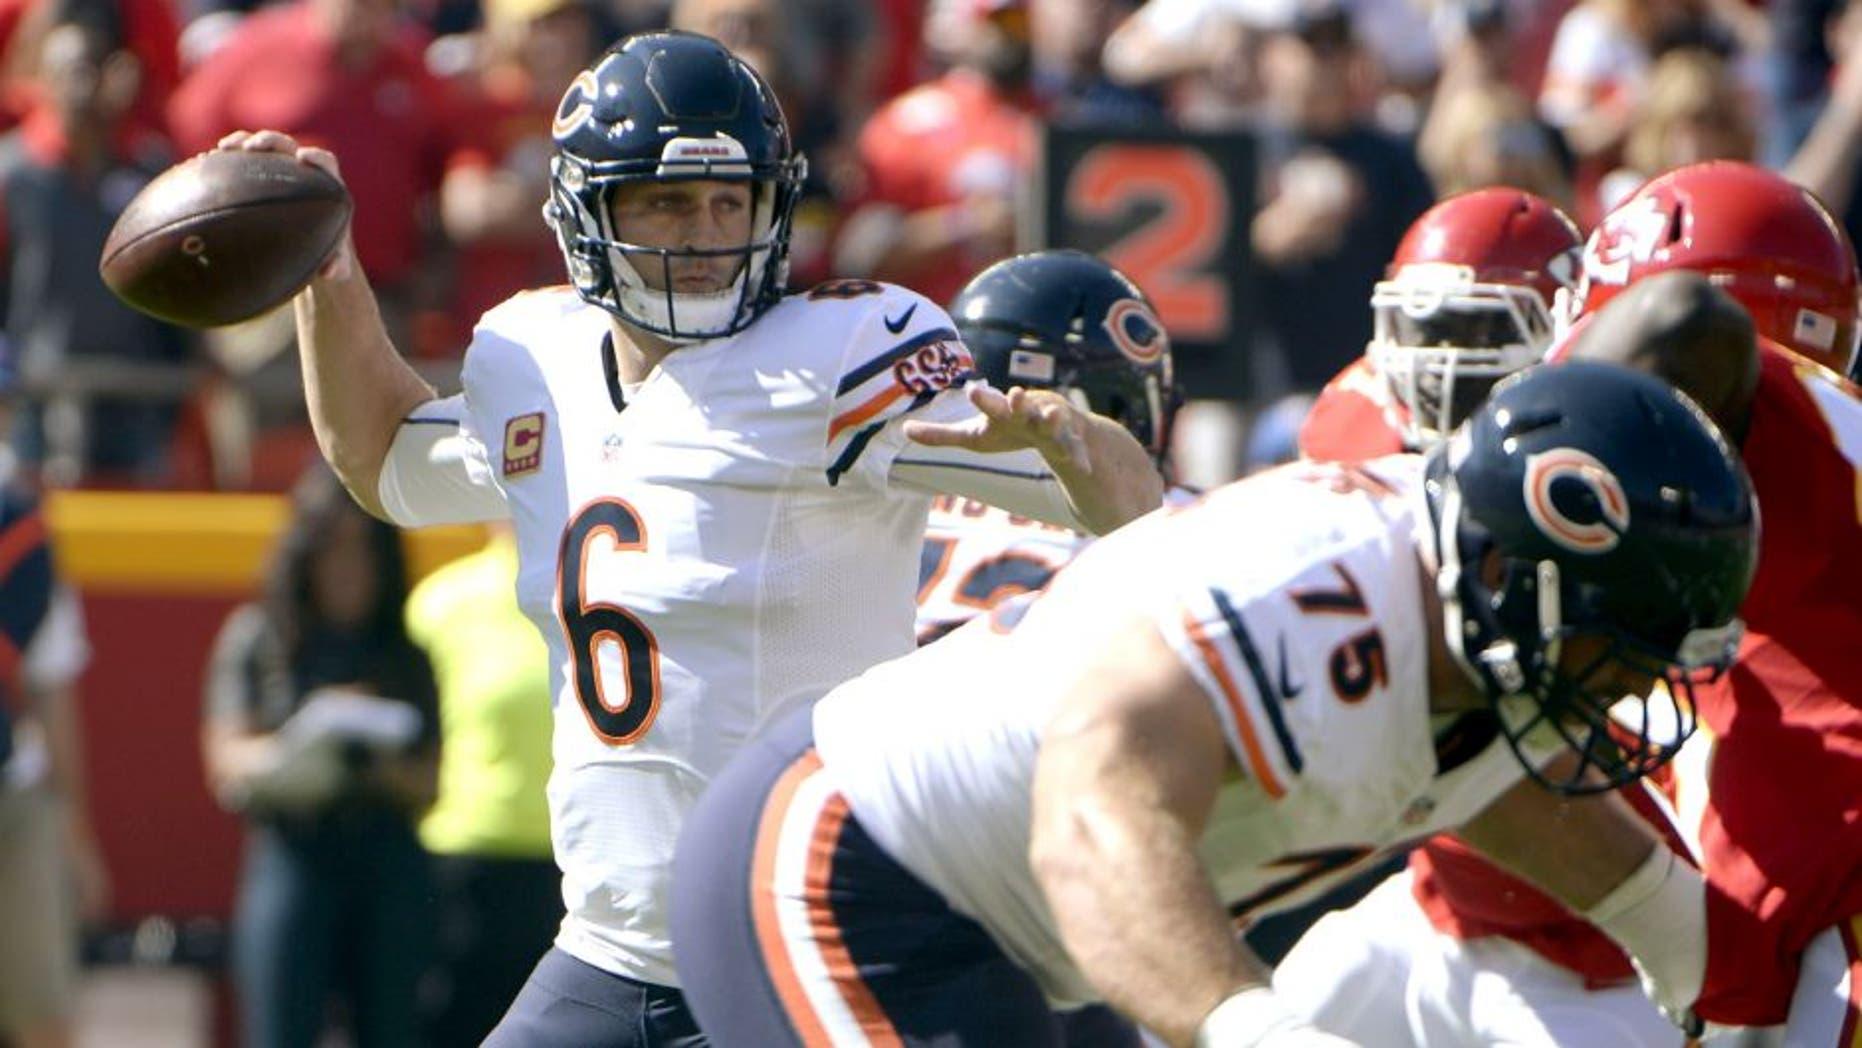 Oct 11, 2015; Kansas City, MO, USA; Chicago Bears quarterback Jay Cutler (6) throws a pass against the Kansas City Chiefs in the first half at Arrowhead Stadium. Mandatory Credit: John Rieger-USA TODAY Sports